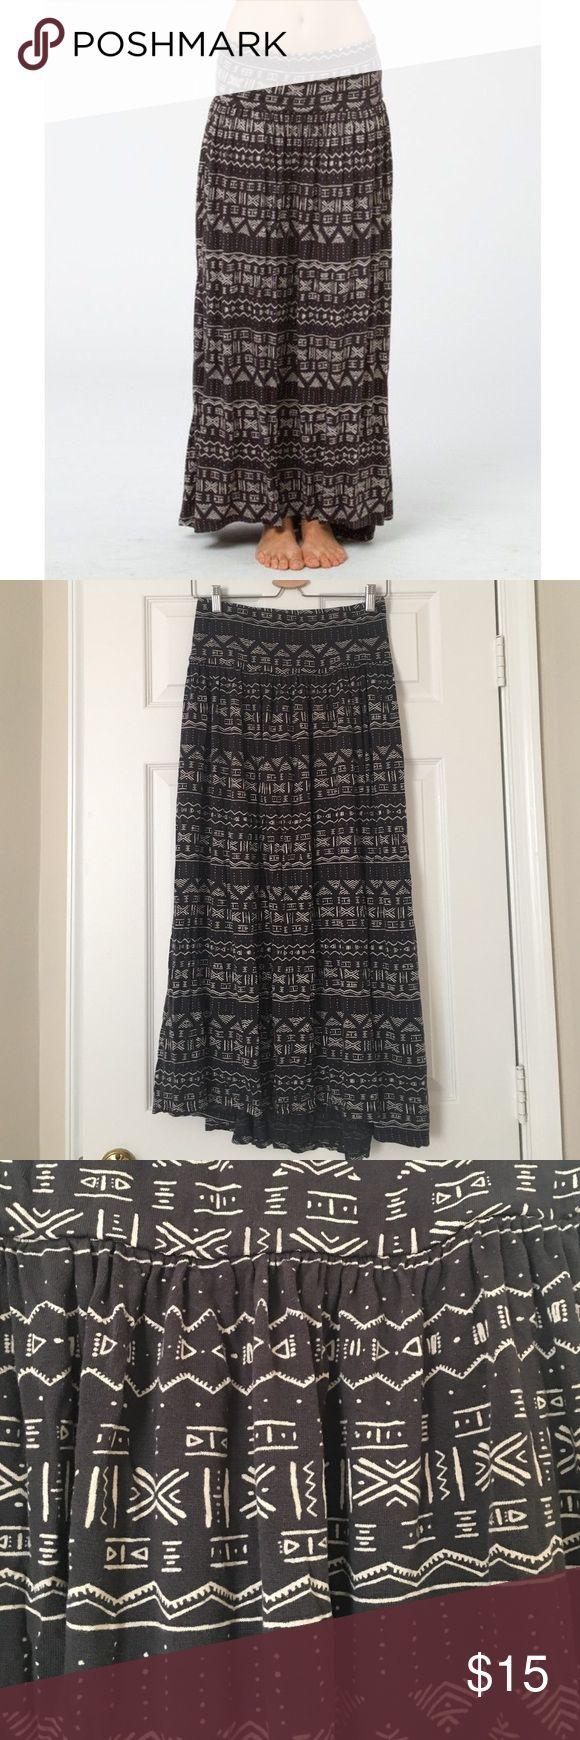 Billabong black tribal maxi skirt Size medium, a bit lower in back than front. Guc for wash wear. Stretch elastic waist! Billabong Skirts Maxi